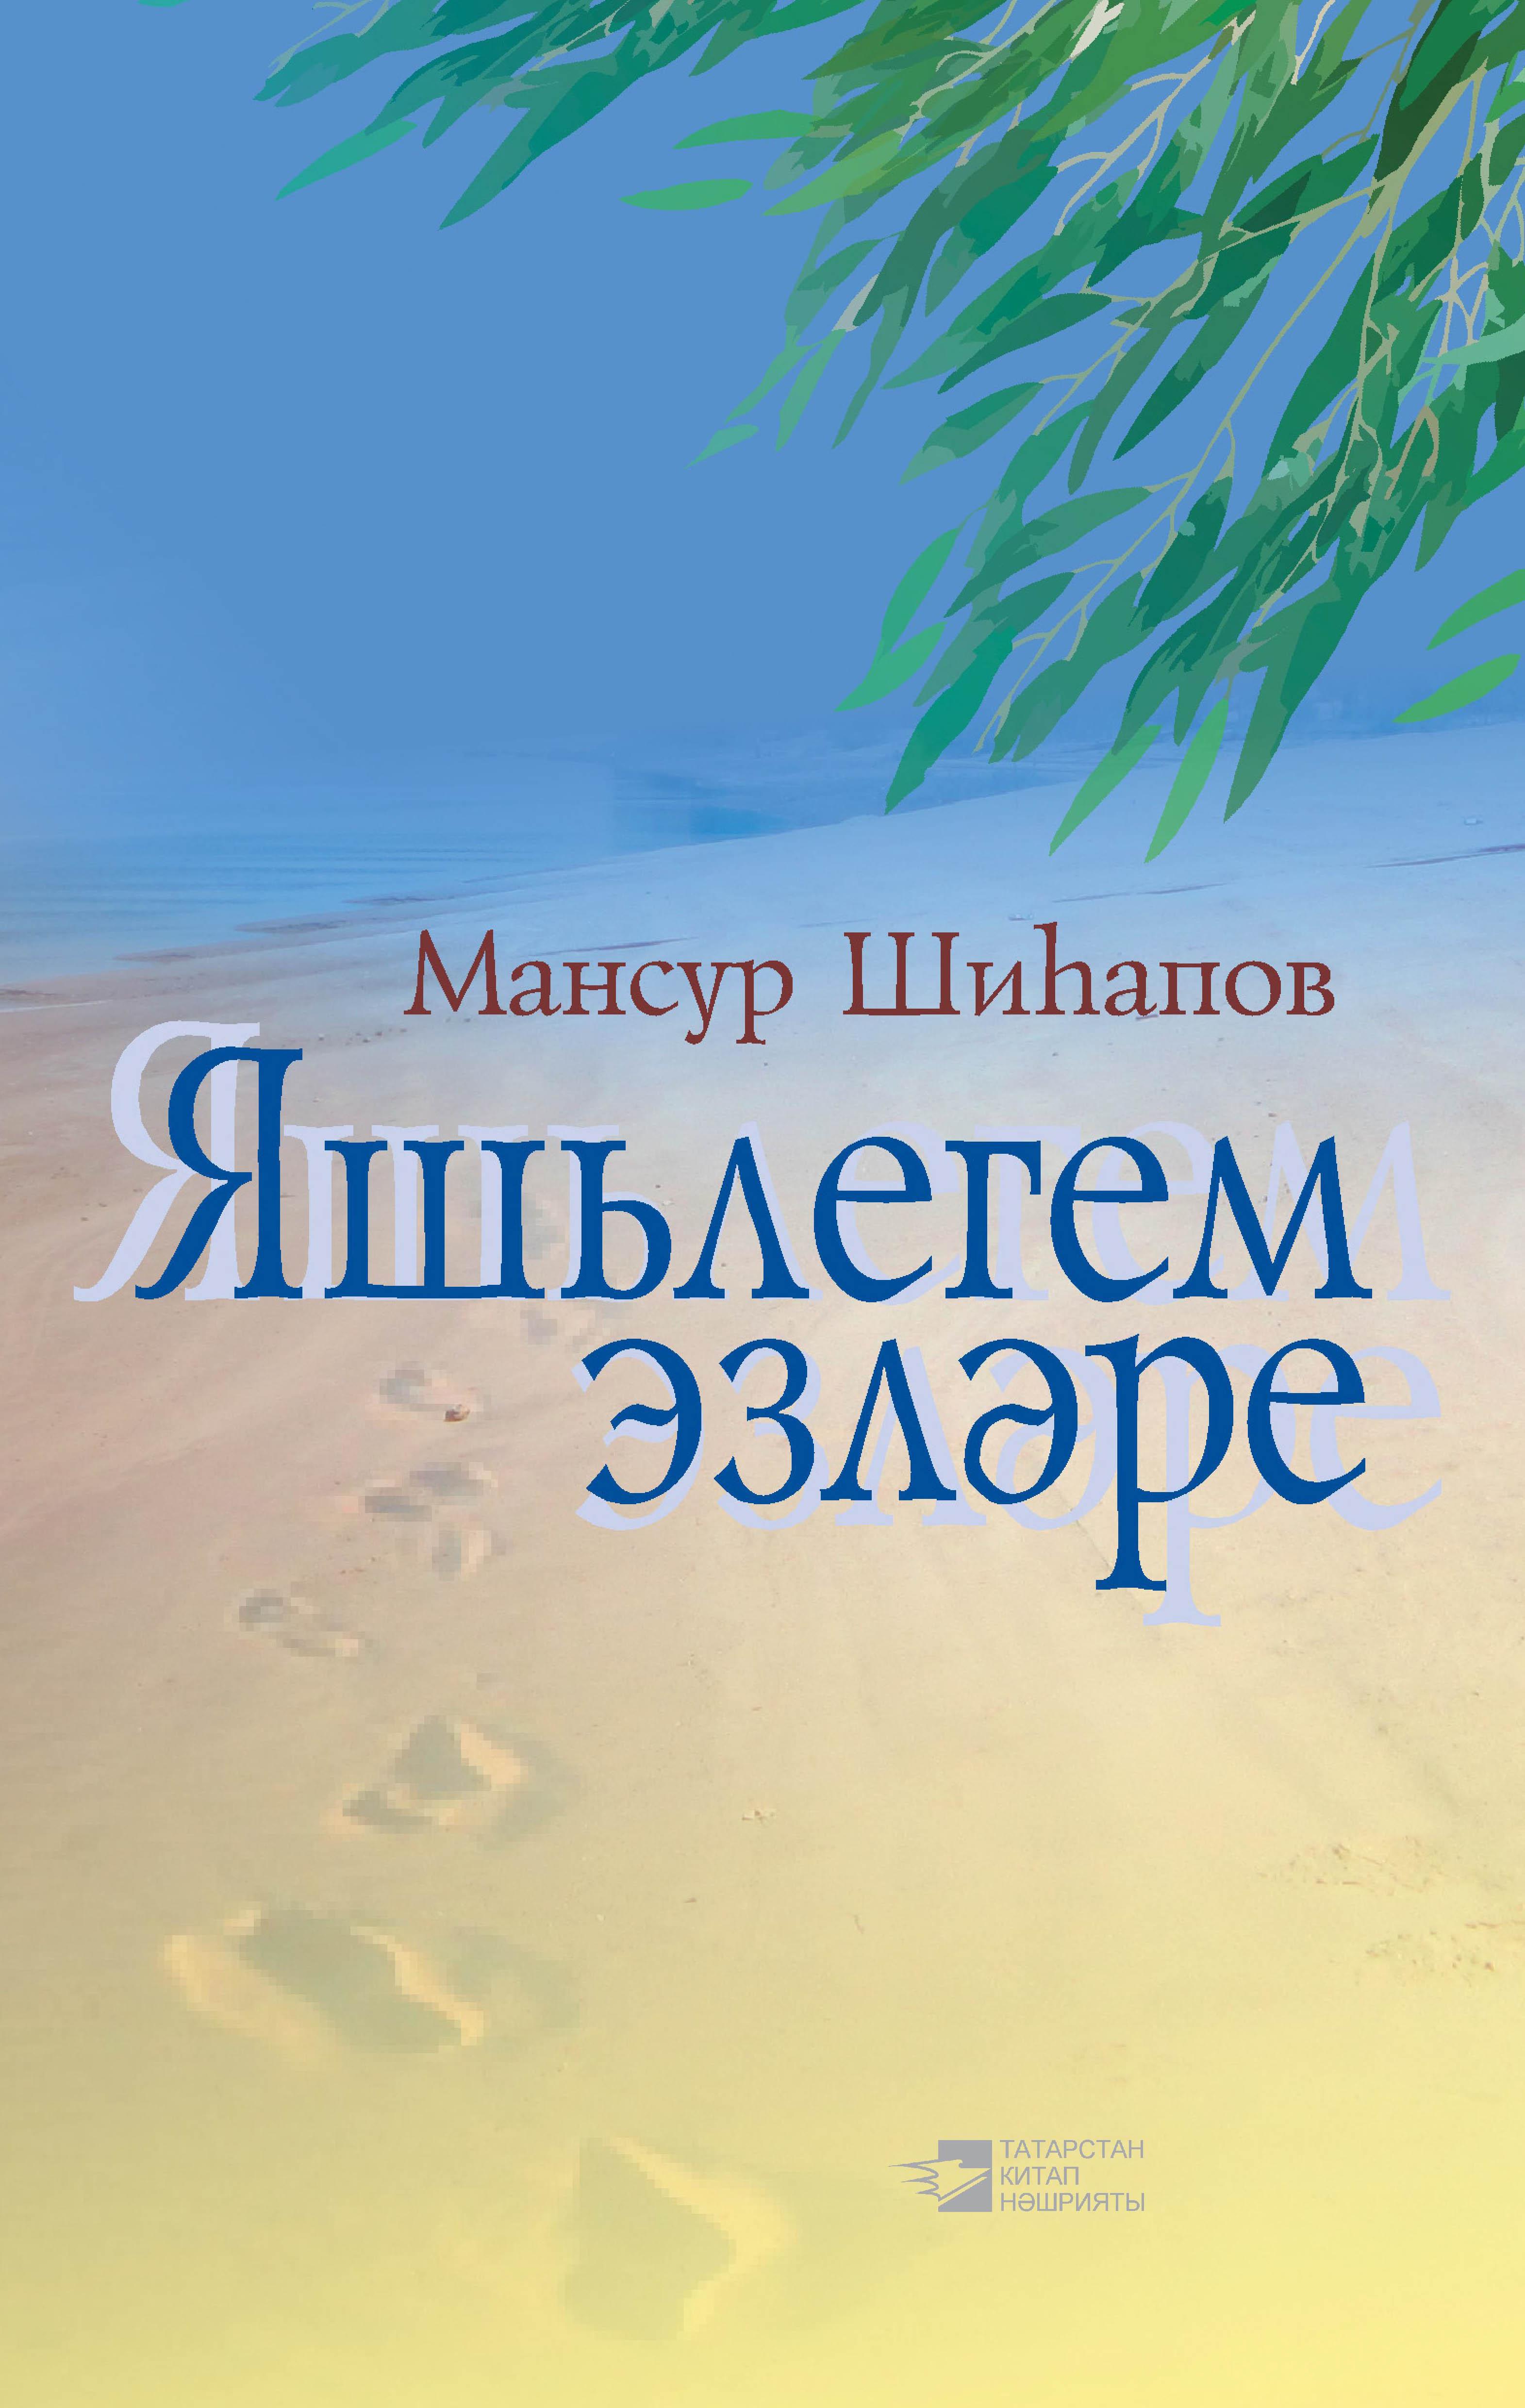 Мансур Шигапов Яшьлегем эзләре: җырлар, мәкаләләр, әңгәмәләр ноутбук скачать книгу